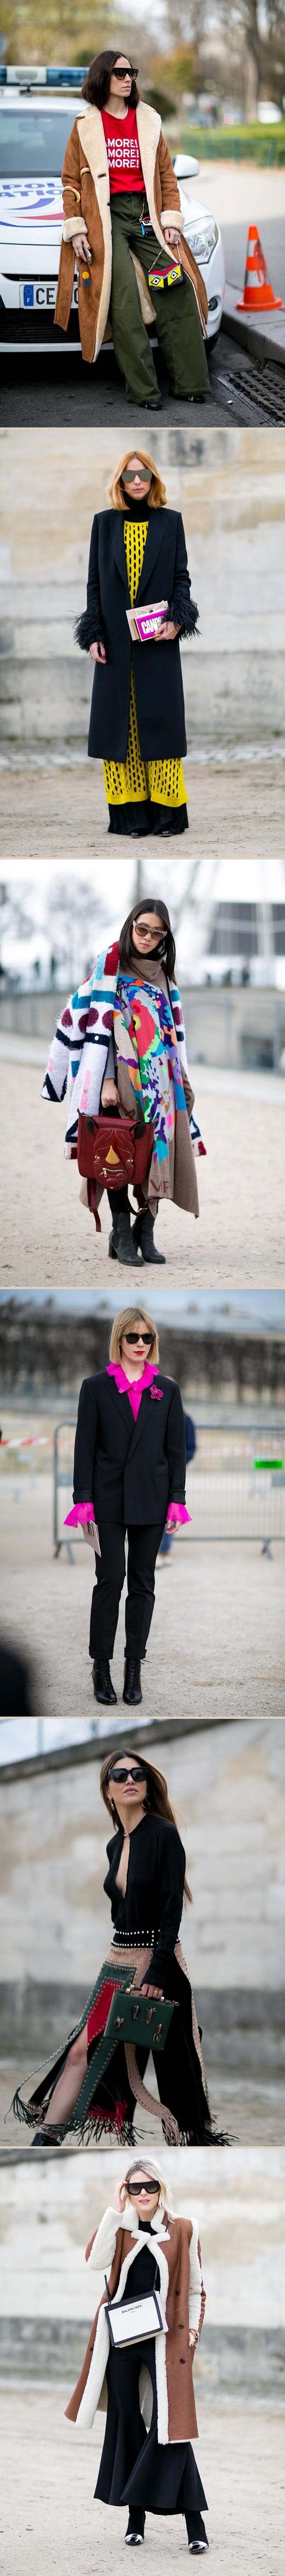 Im from Paris - Cleon Gostinski - Fonte Fashion House Global